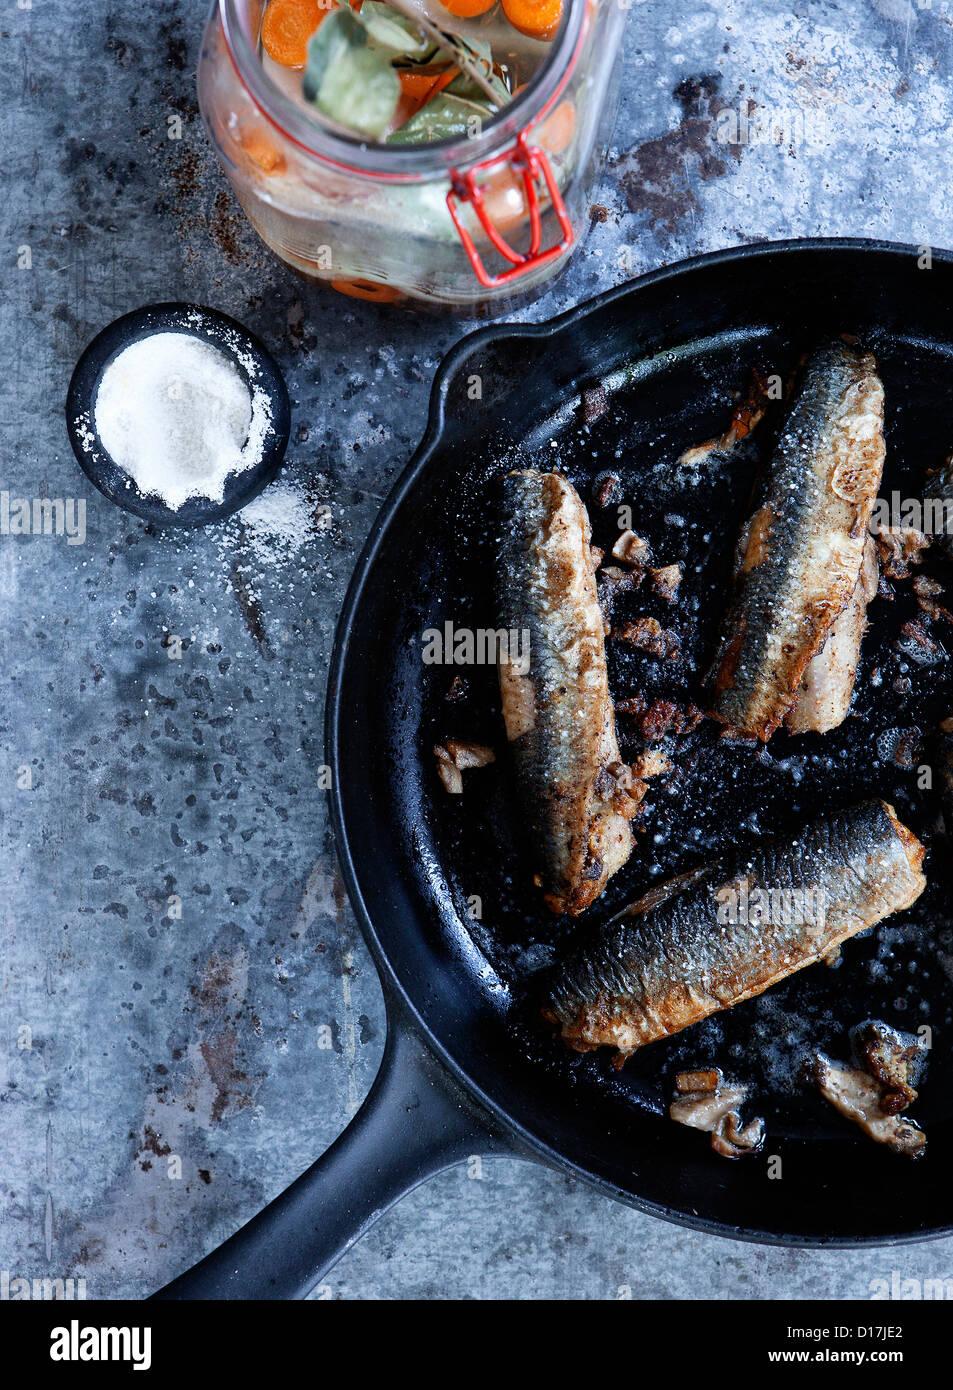 Pan of fried fish - Stock Image